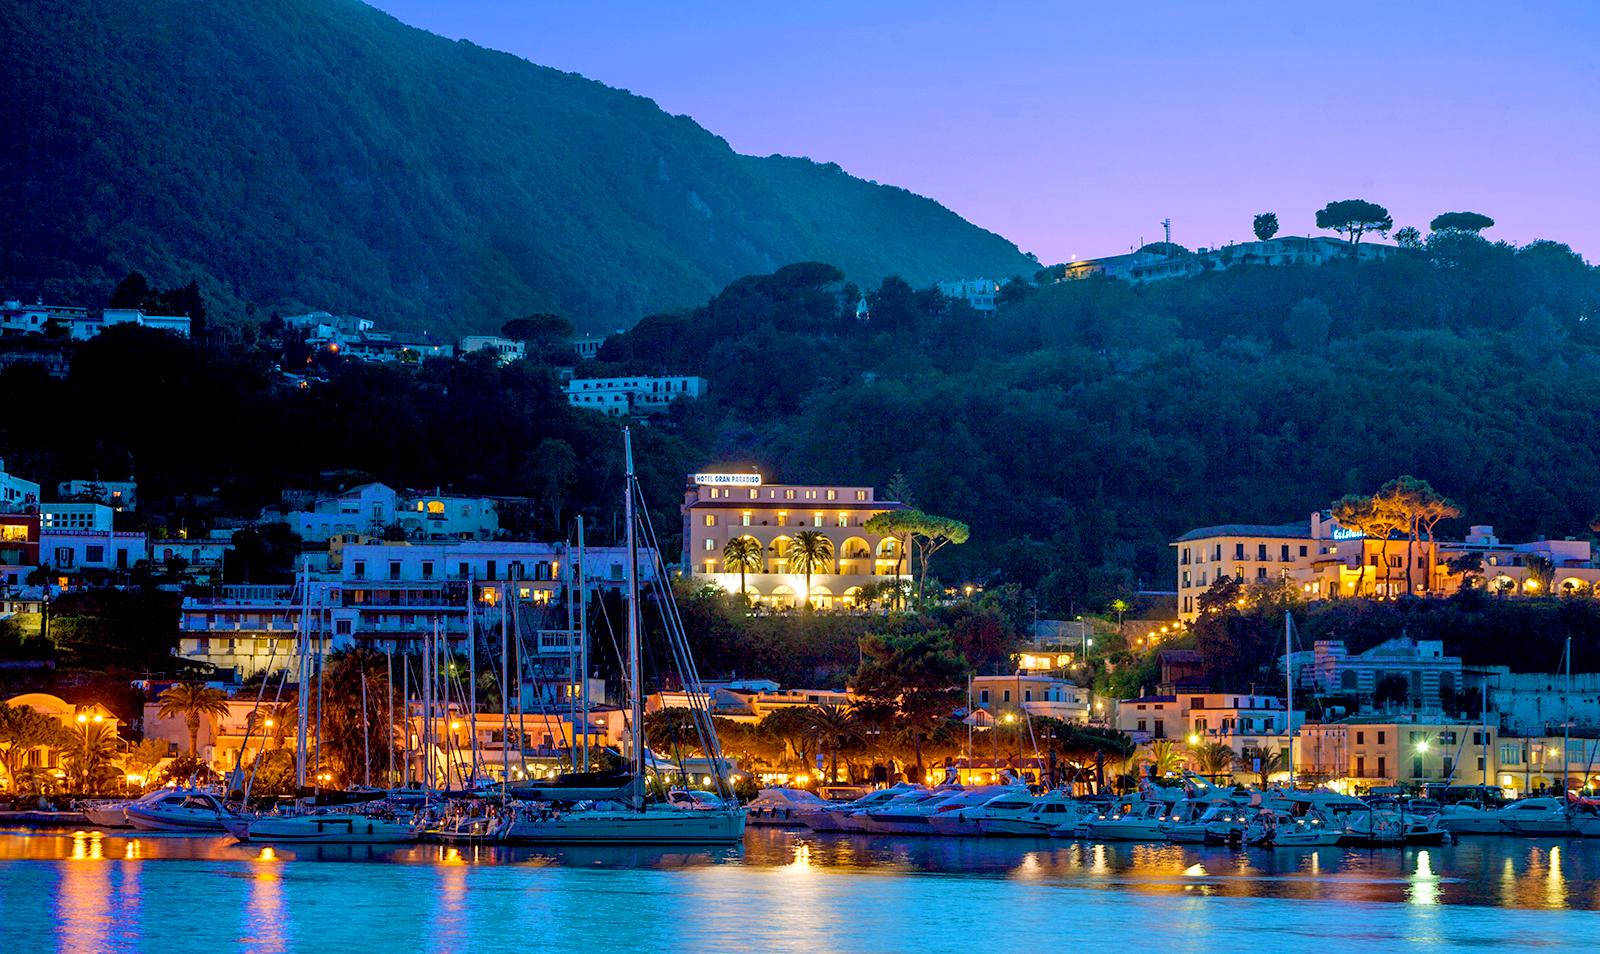 hotel-terme-gran-paradiso-ischia-casamicciola-sera